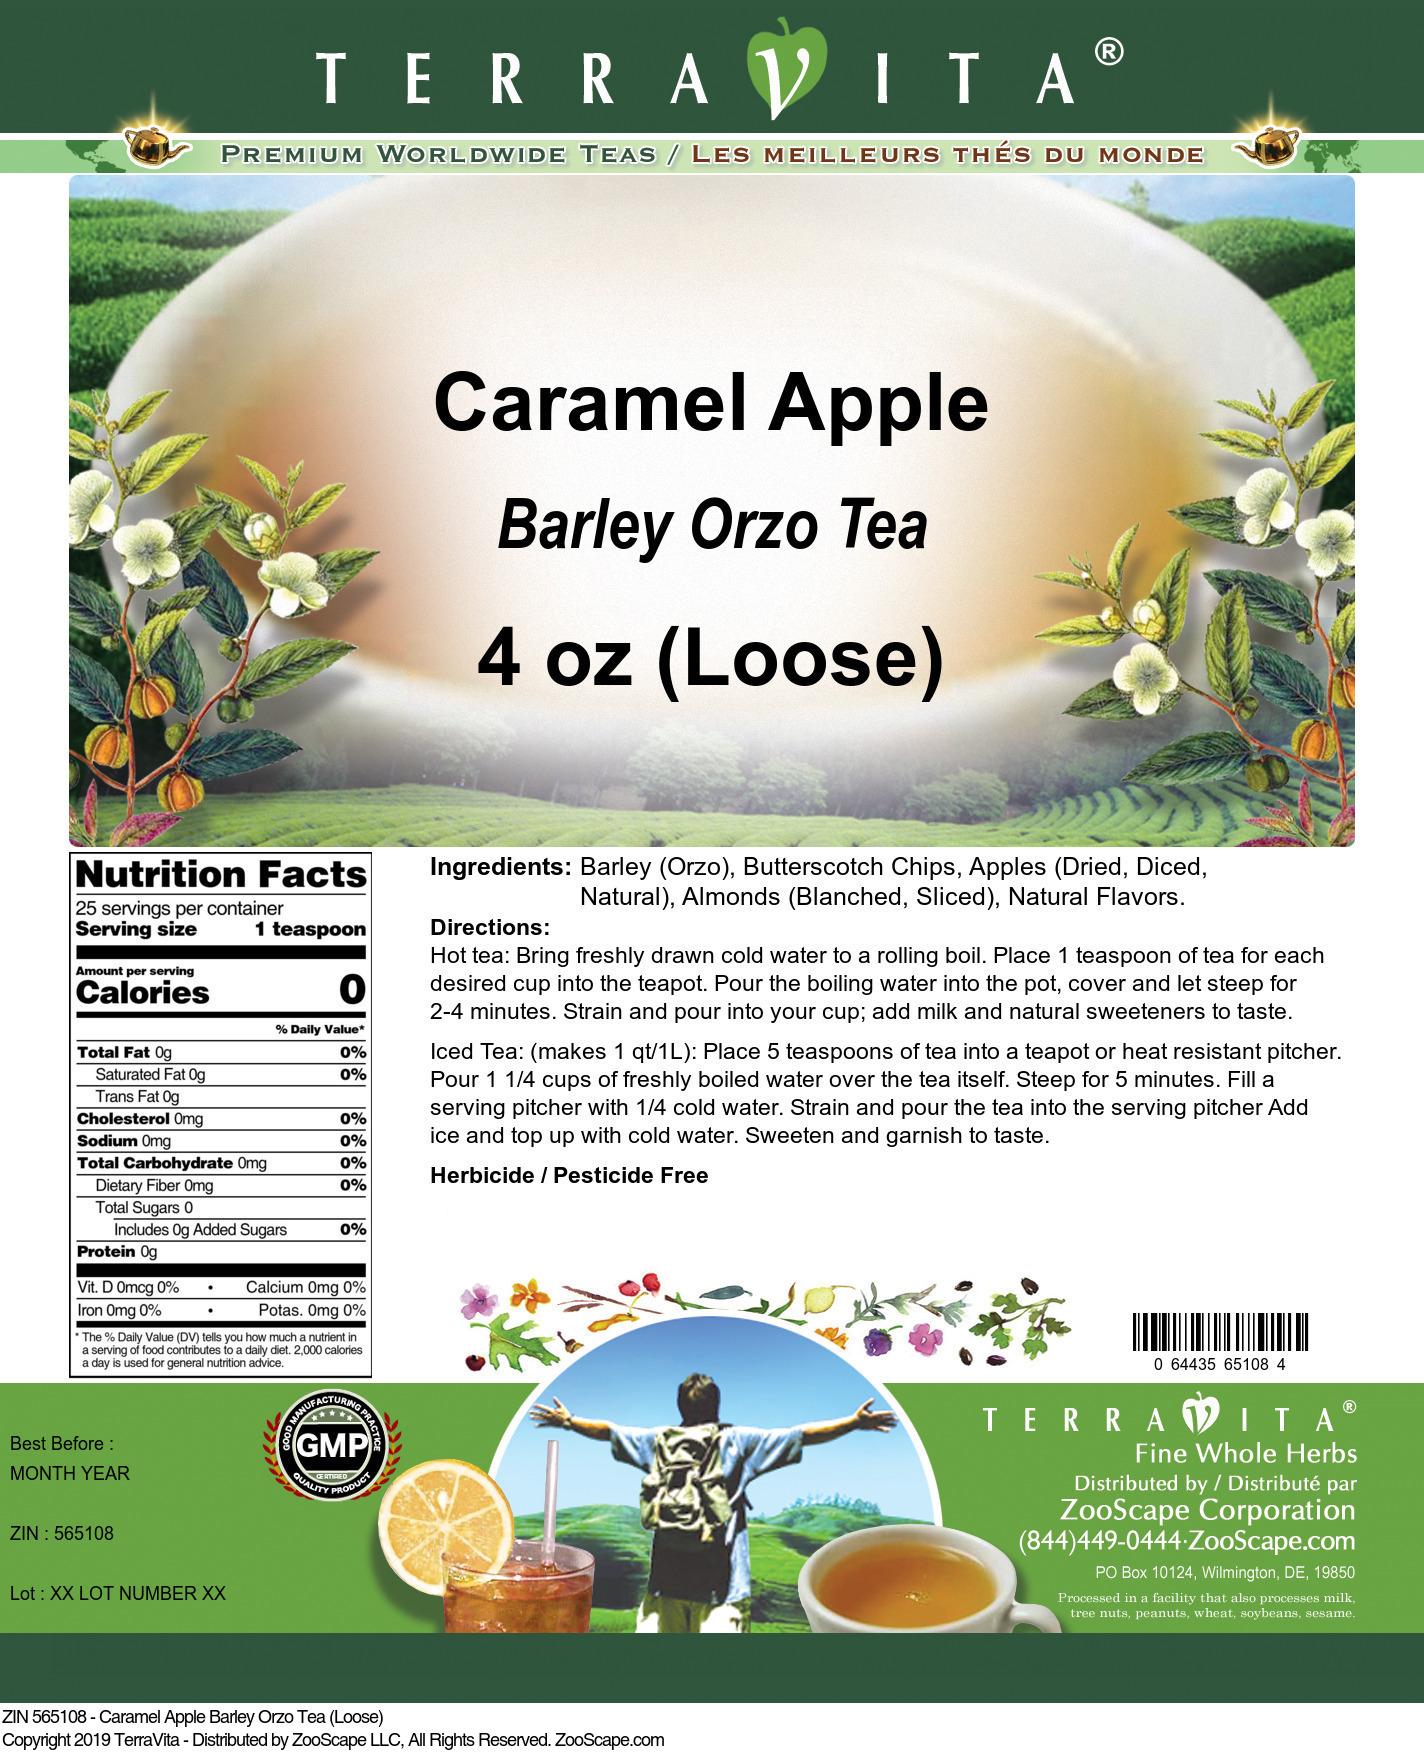 Caramel Apple Barley Orzo